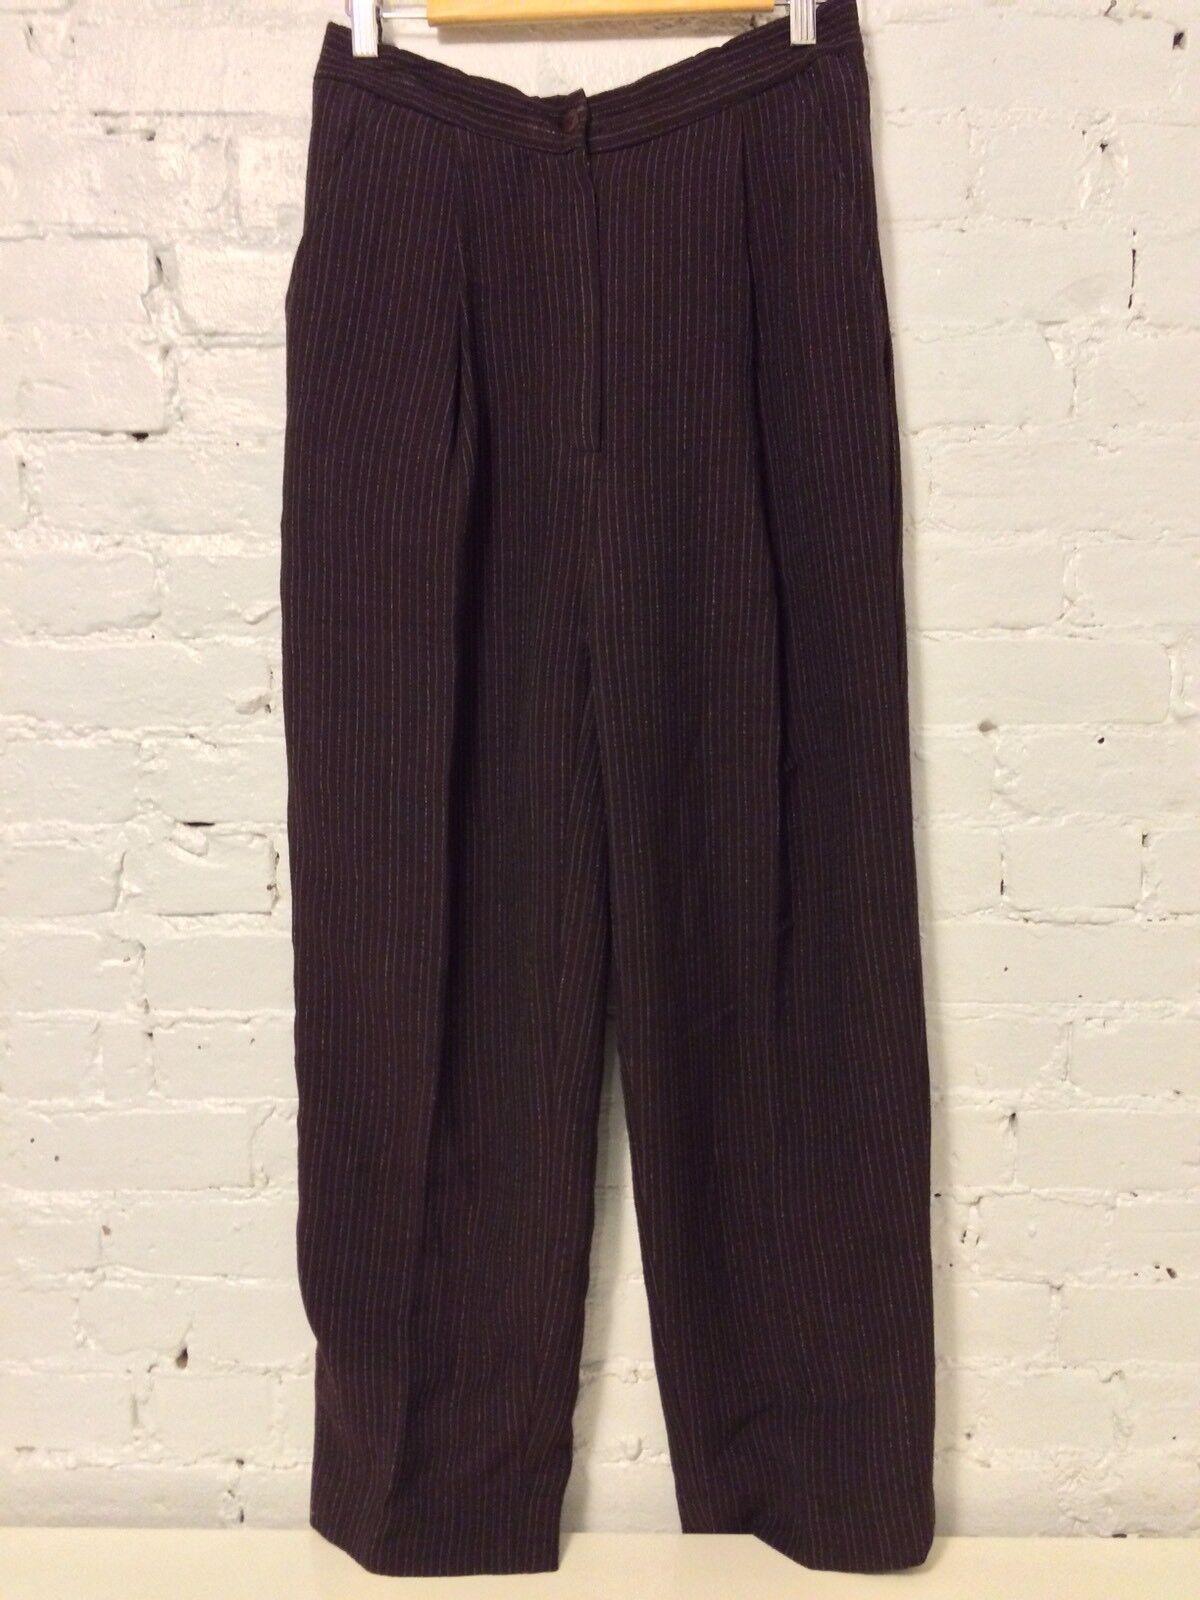 Eileen Fisher Wool Pleated Crop Dress Pants High Waist Metallic Stripe Brown  L